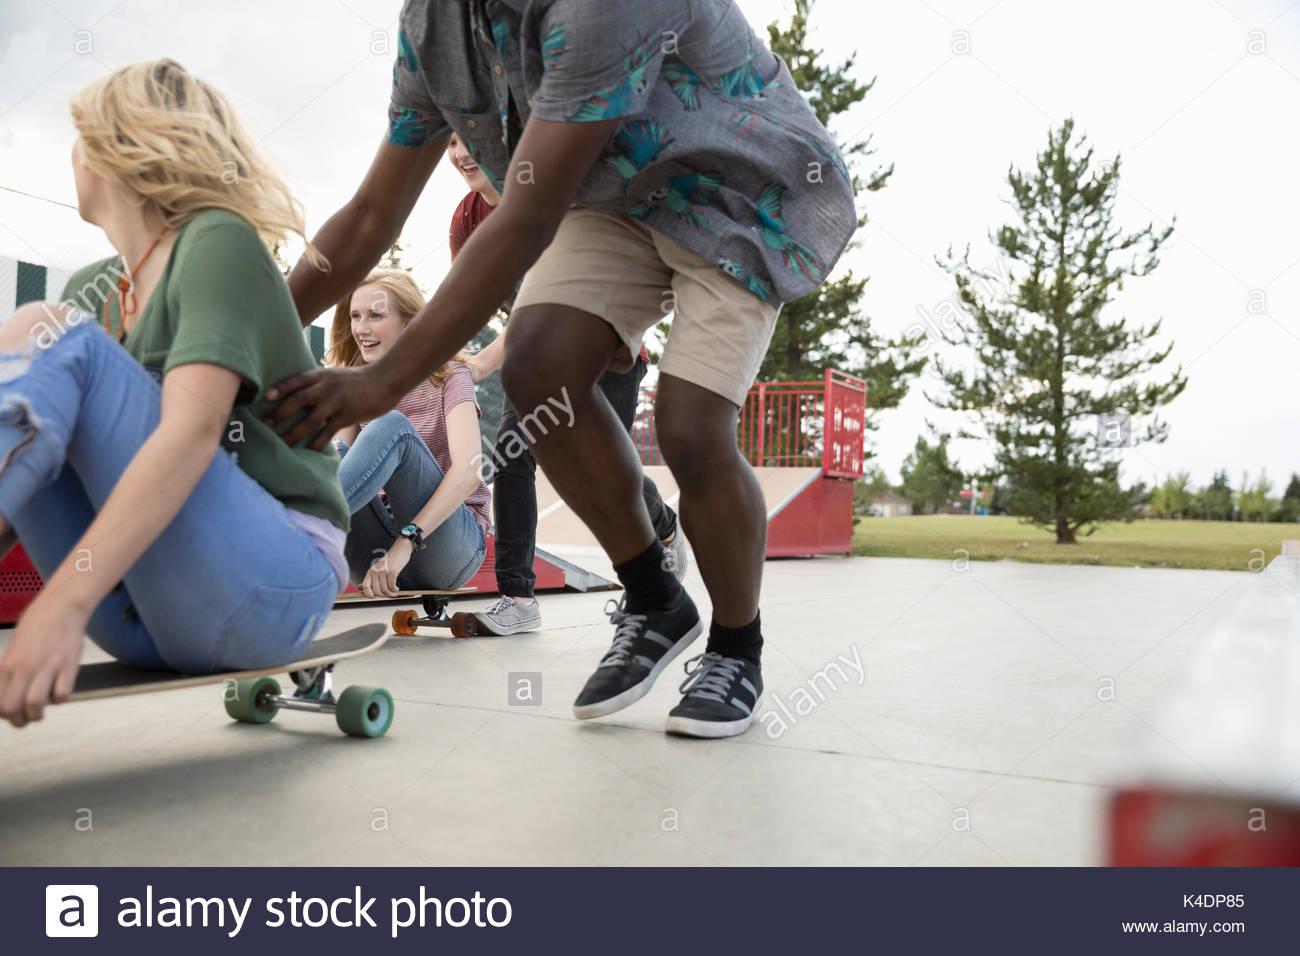 Teenage amici giocando, spingendo skateboard in skate park Immagini Stock